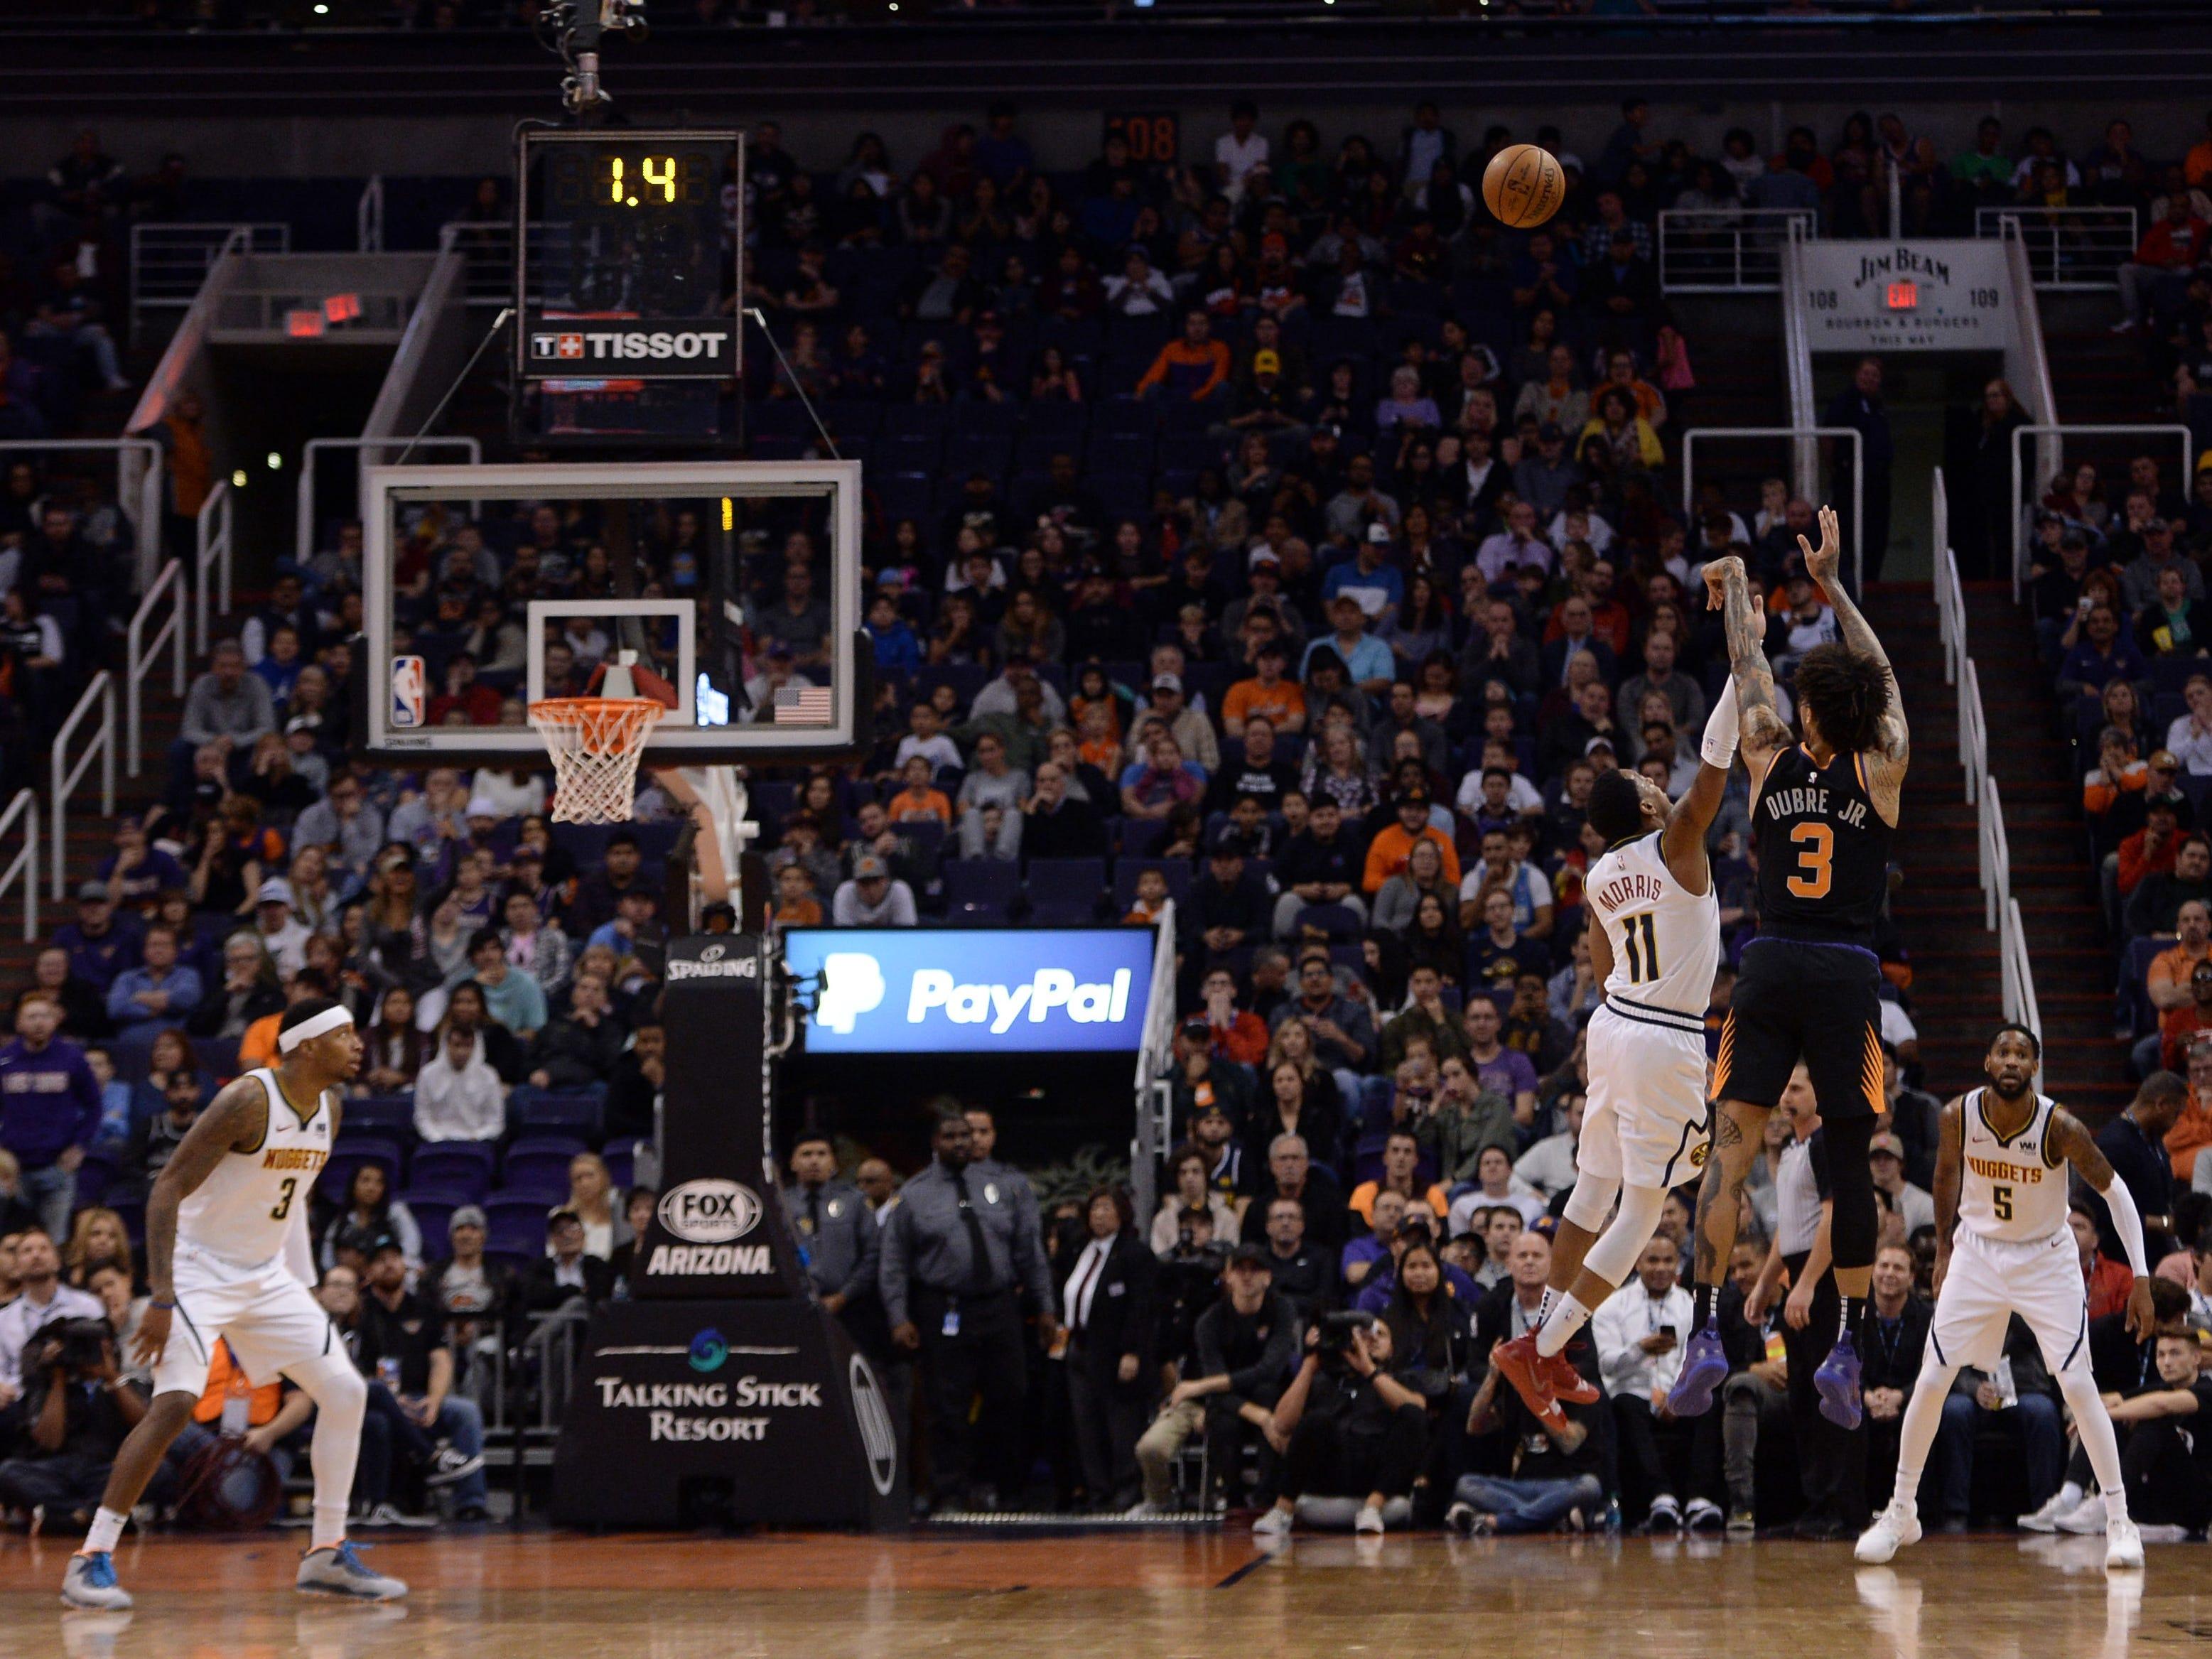 Jan 12, 2019; Phoenix, AZ, USA; Phoenix Suns forward Kelly Oubre Jr. (3) shoots a buzzer beater three point shot against the Denver Nuggets during the second half. (Joe Camporeale-USA TODAY Sports)